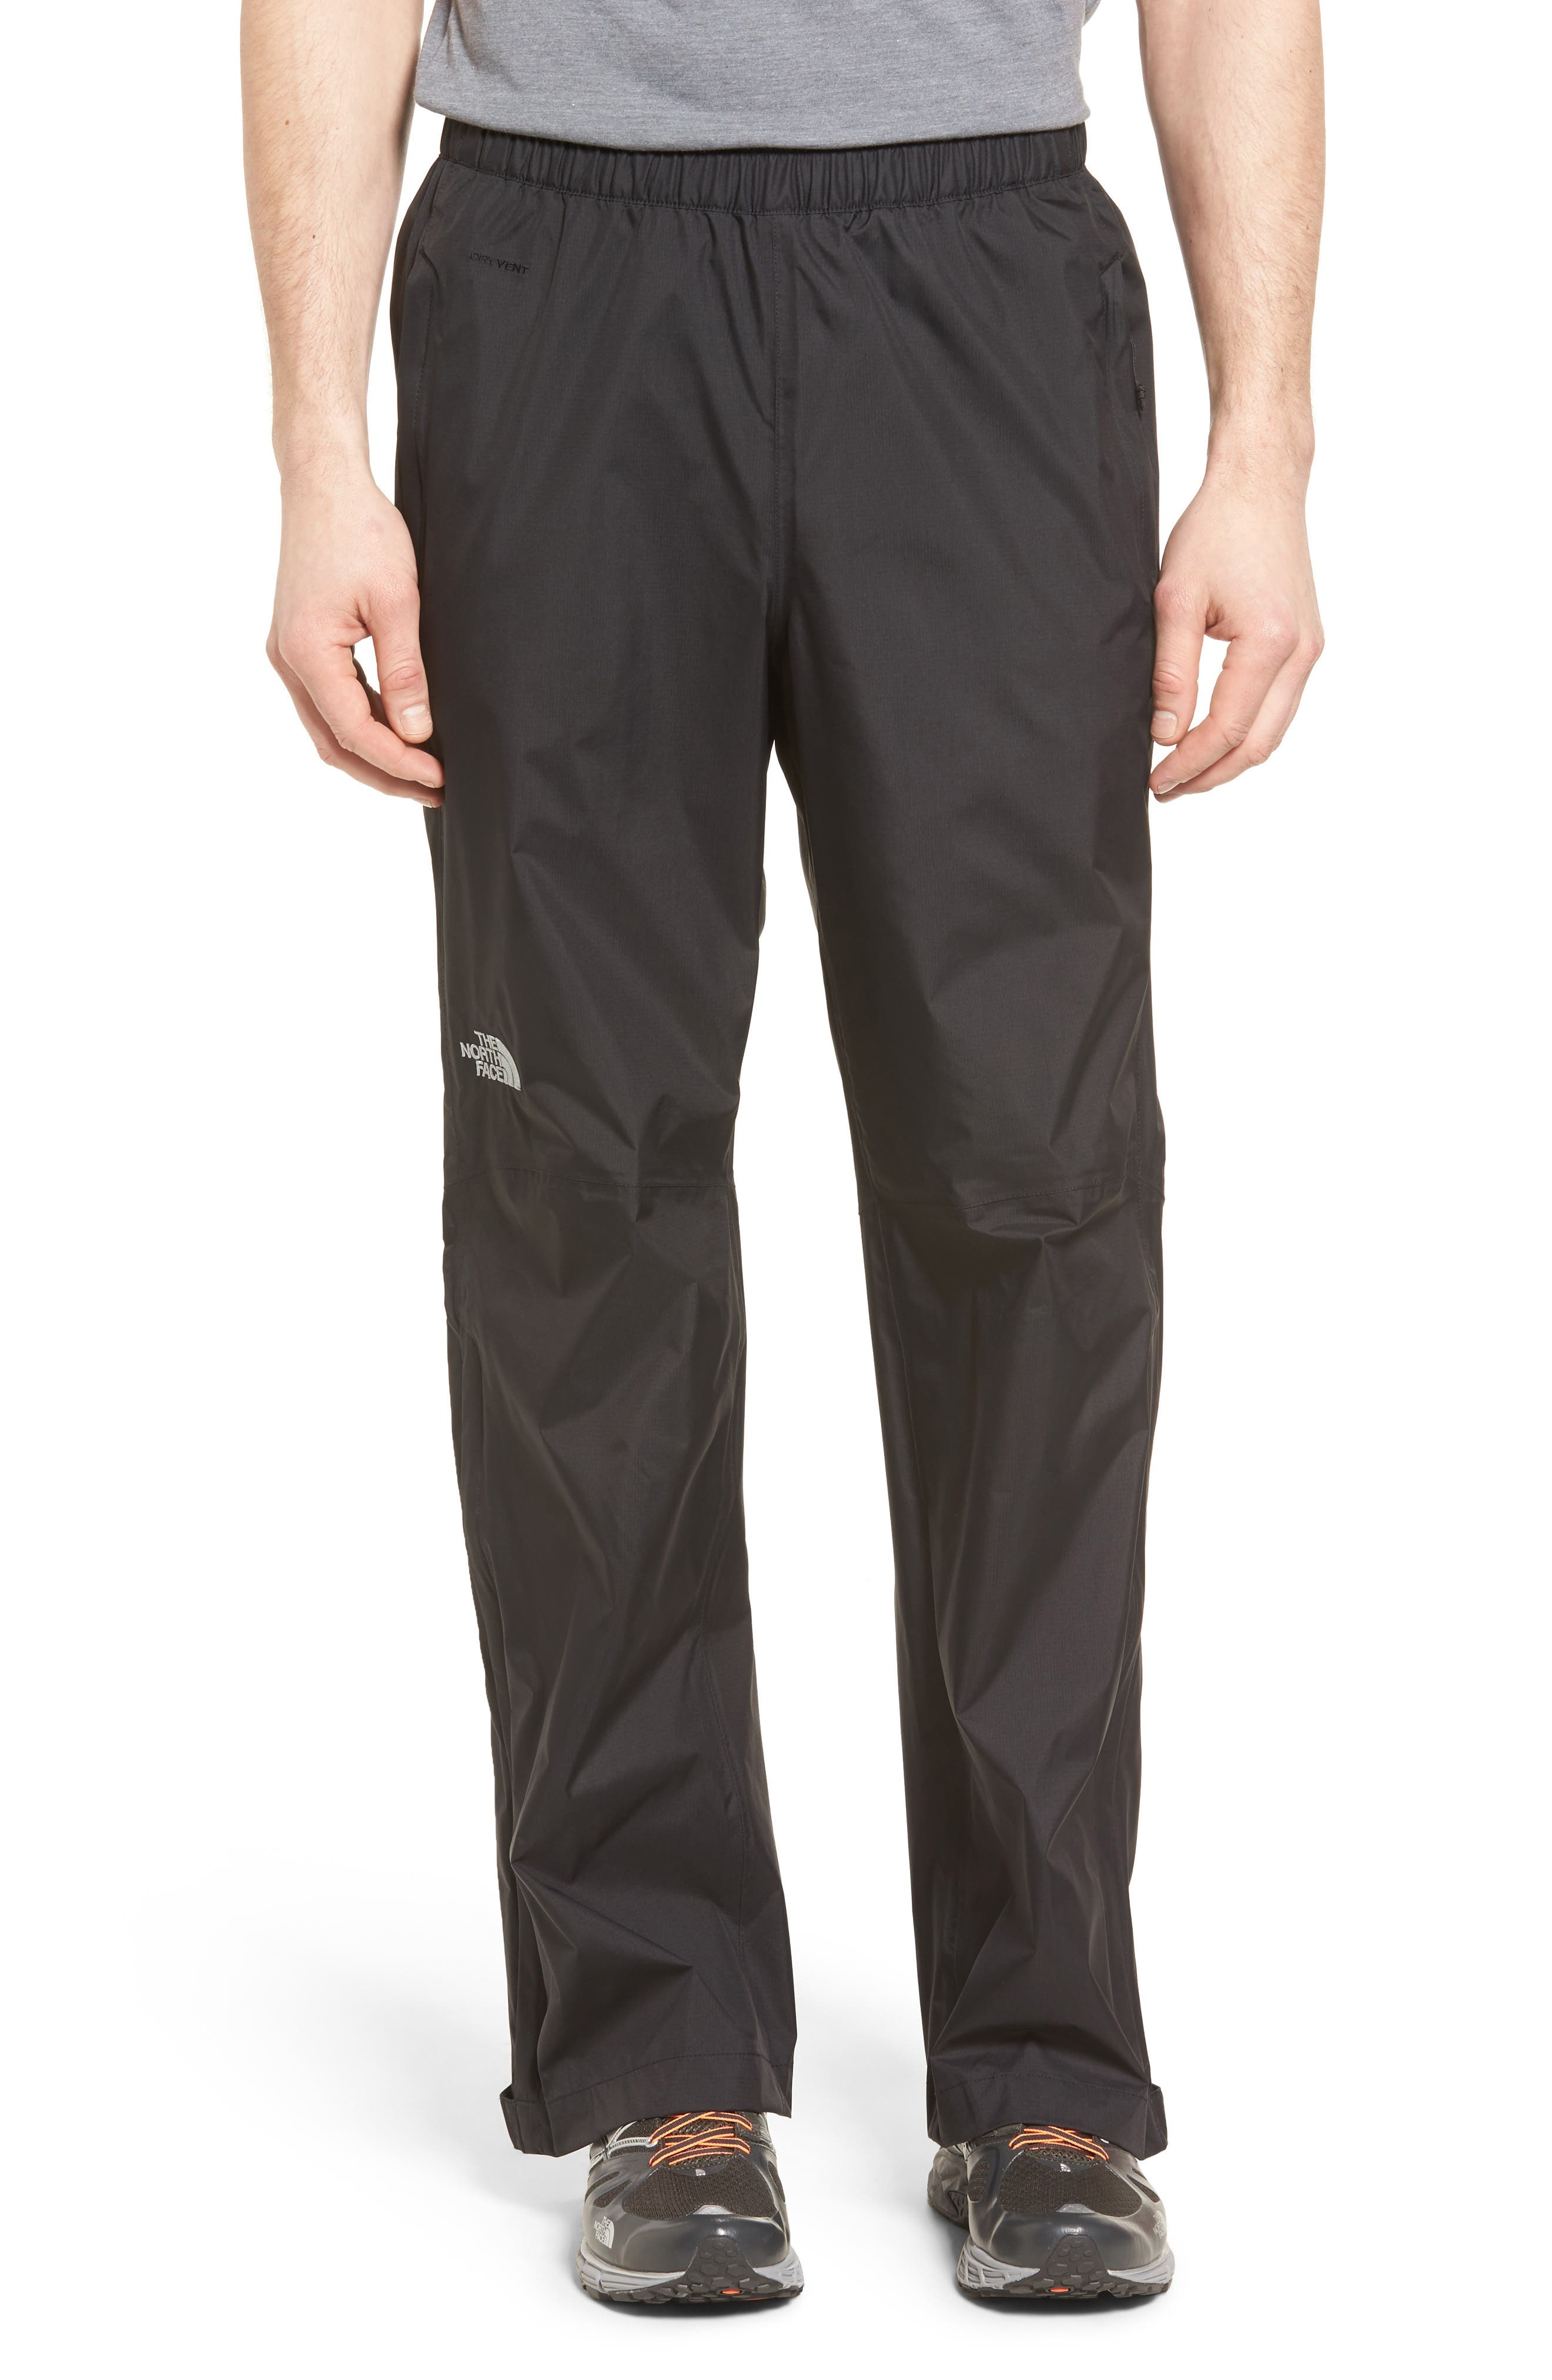 Venture Waterproof Pants,                             Main thumbnail 1, color,                             001